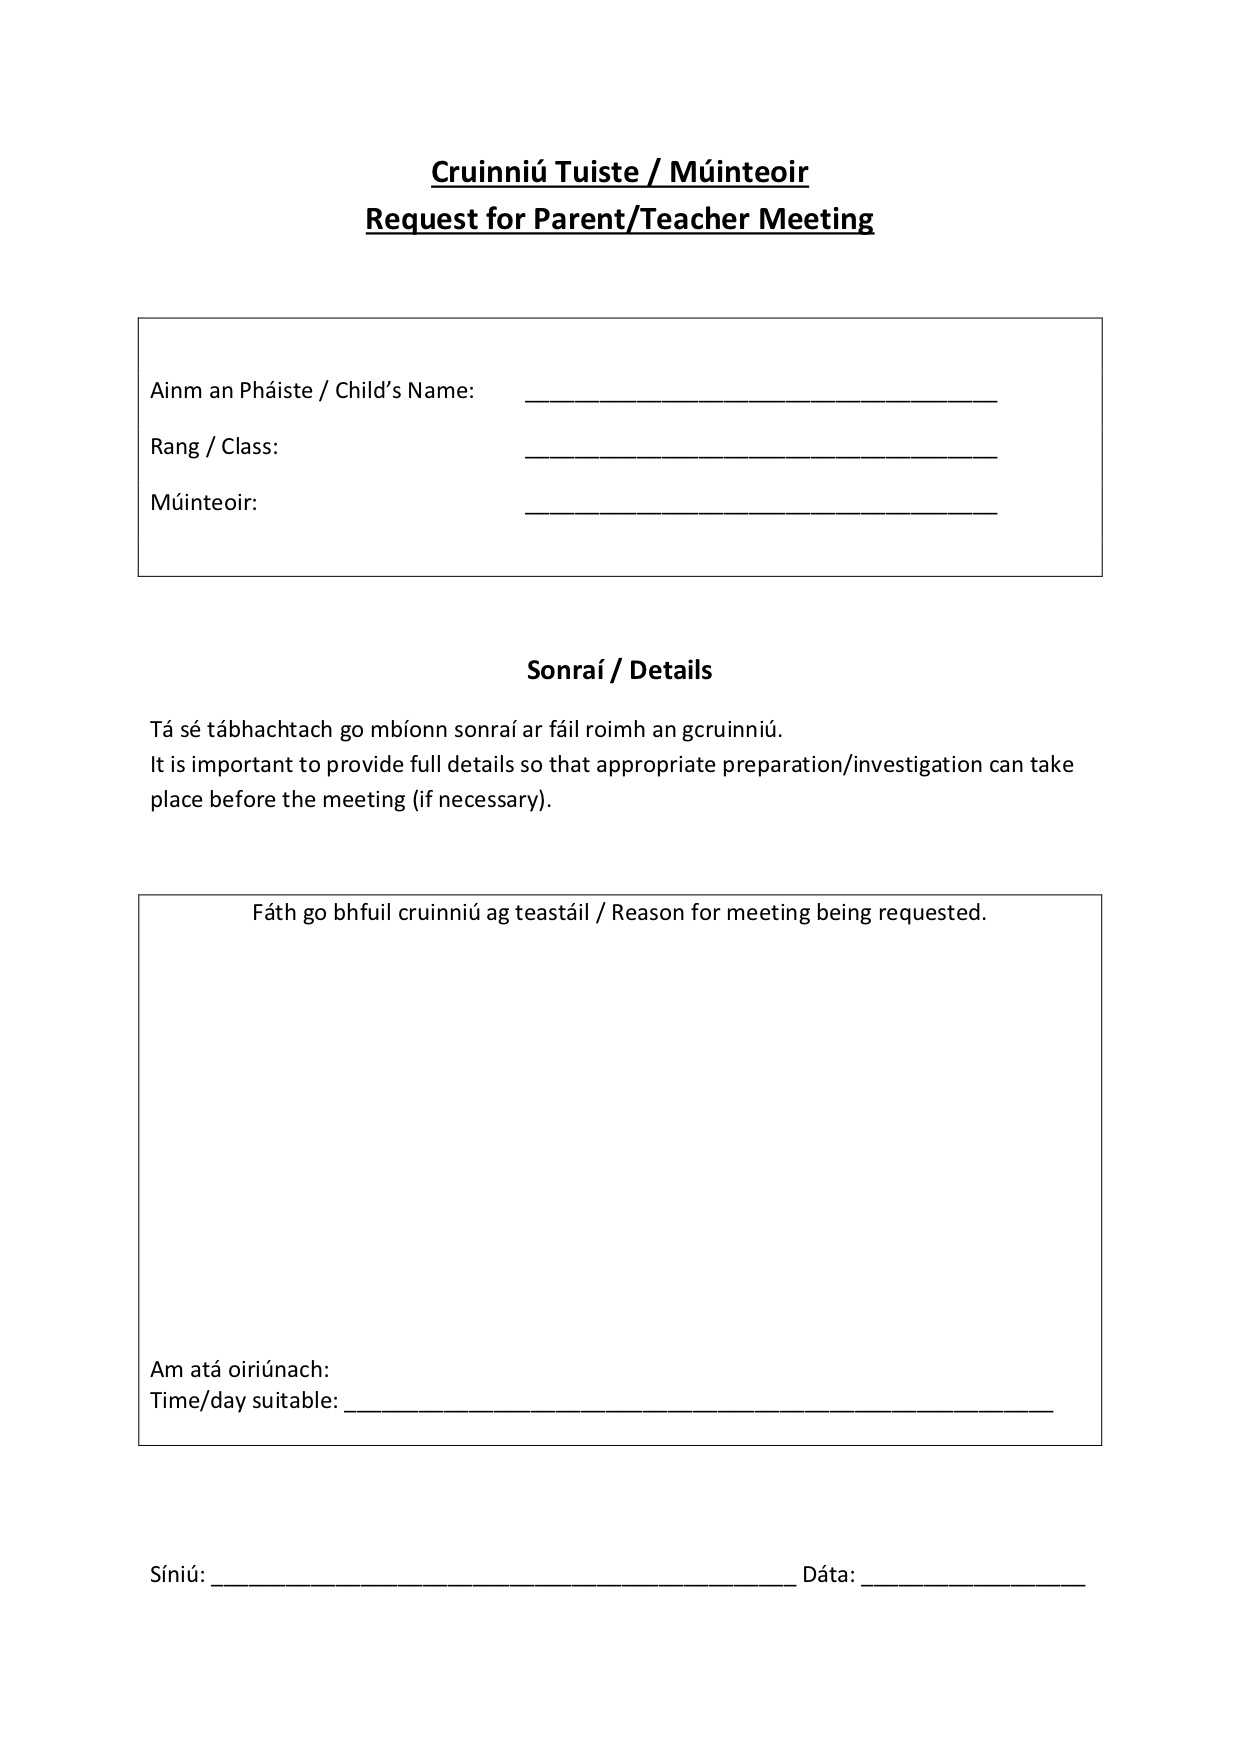 Request for Parent:Teacher Meeting